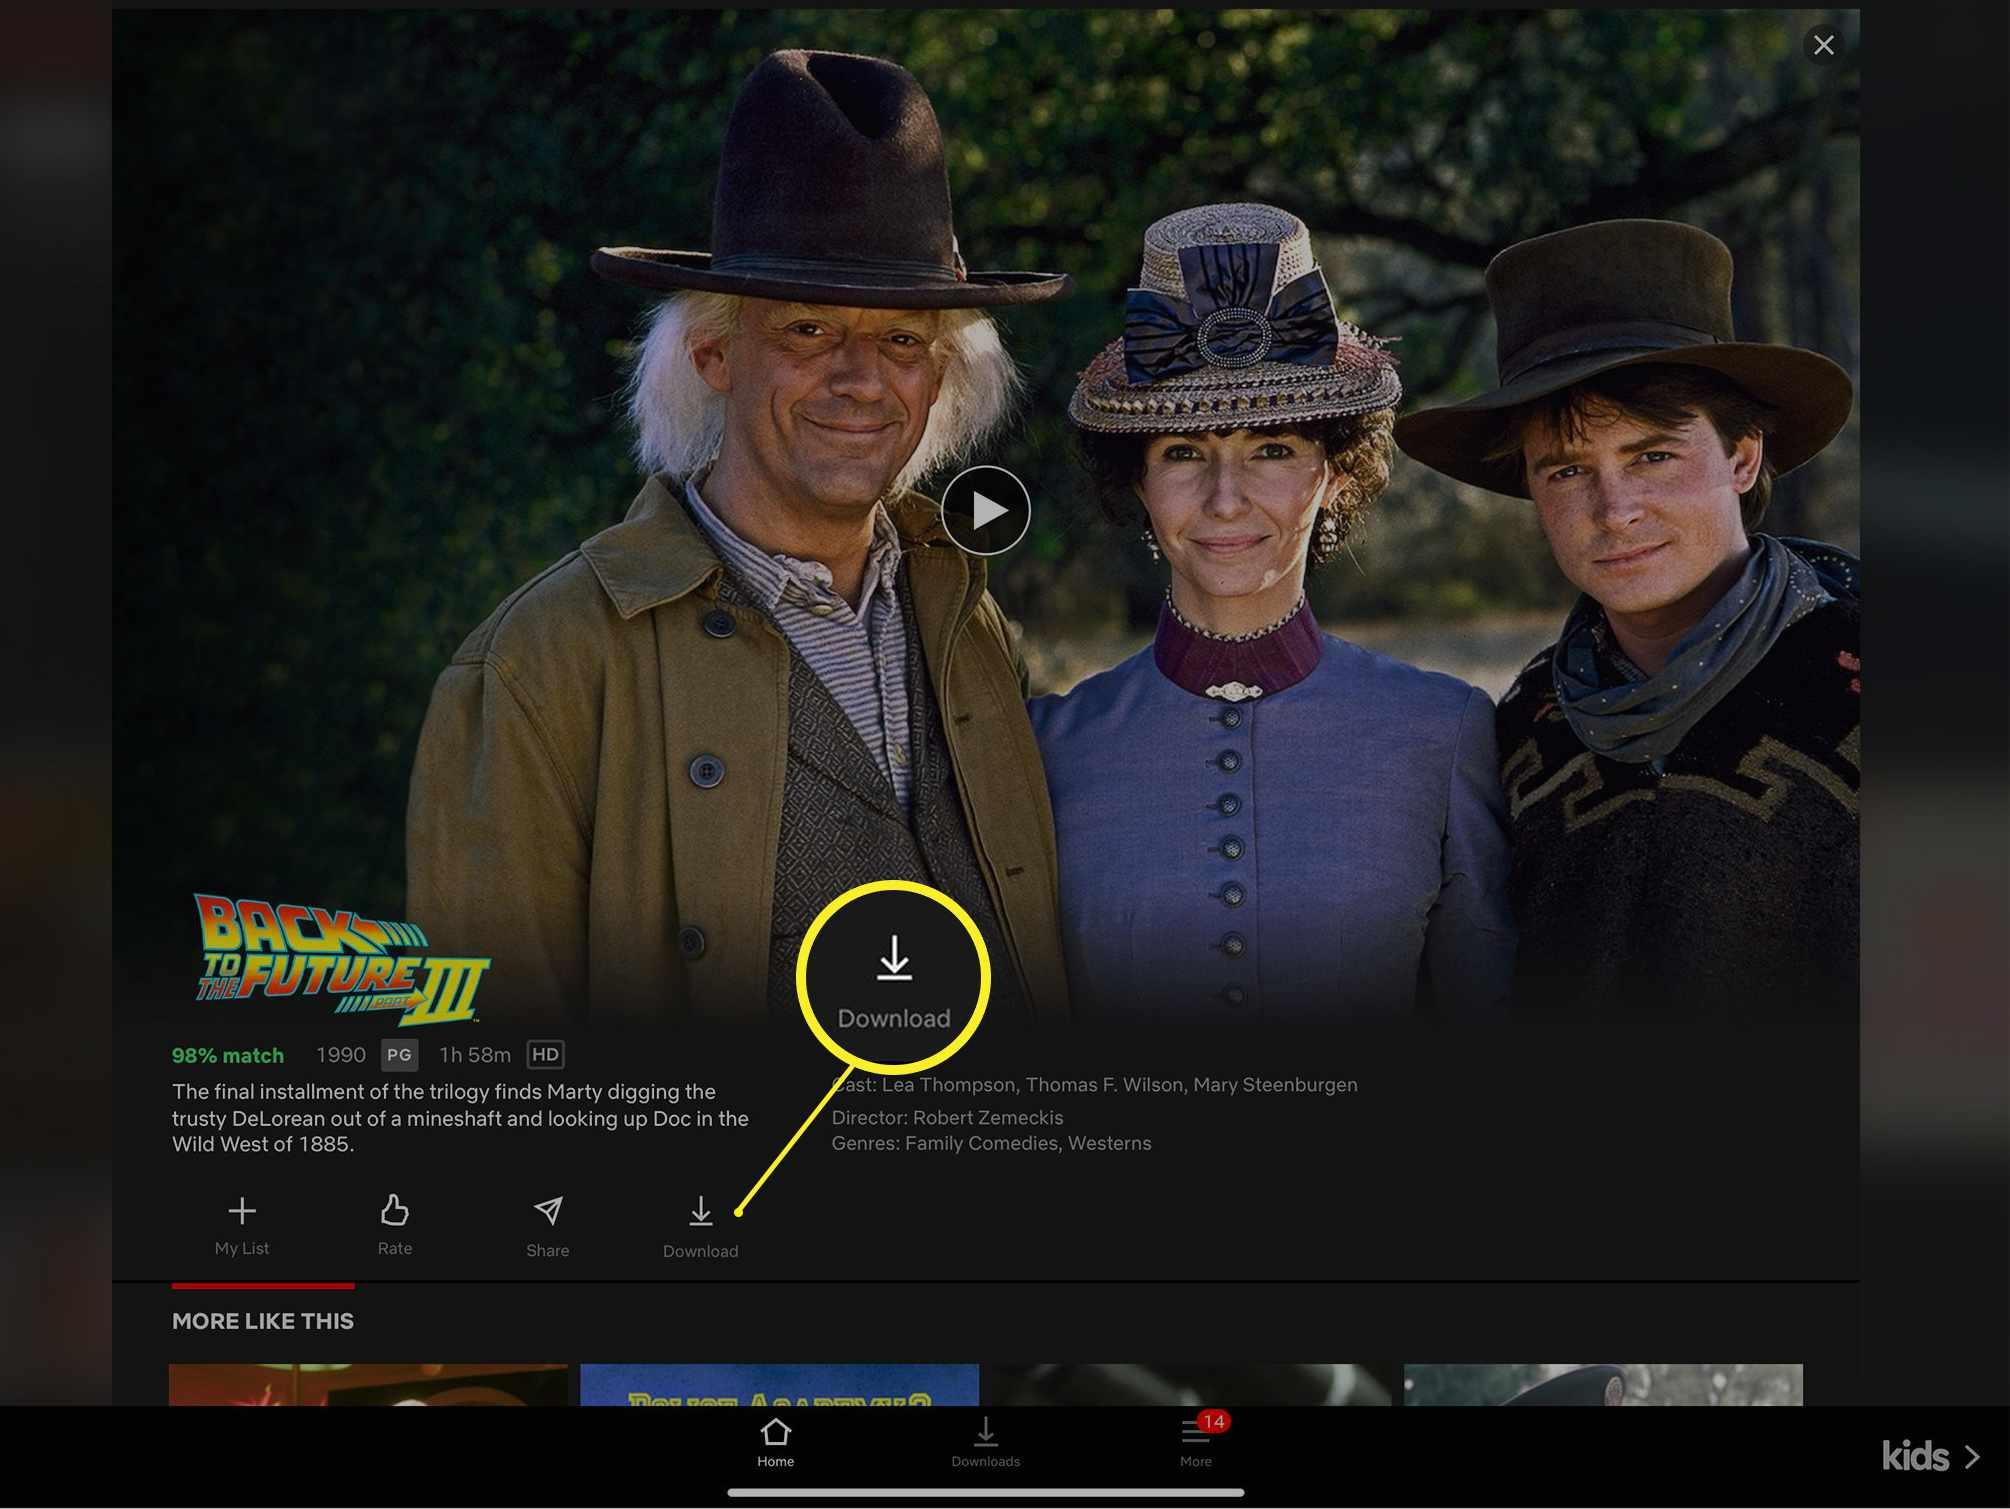 Netflix download link